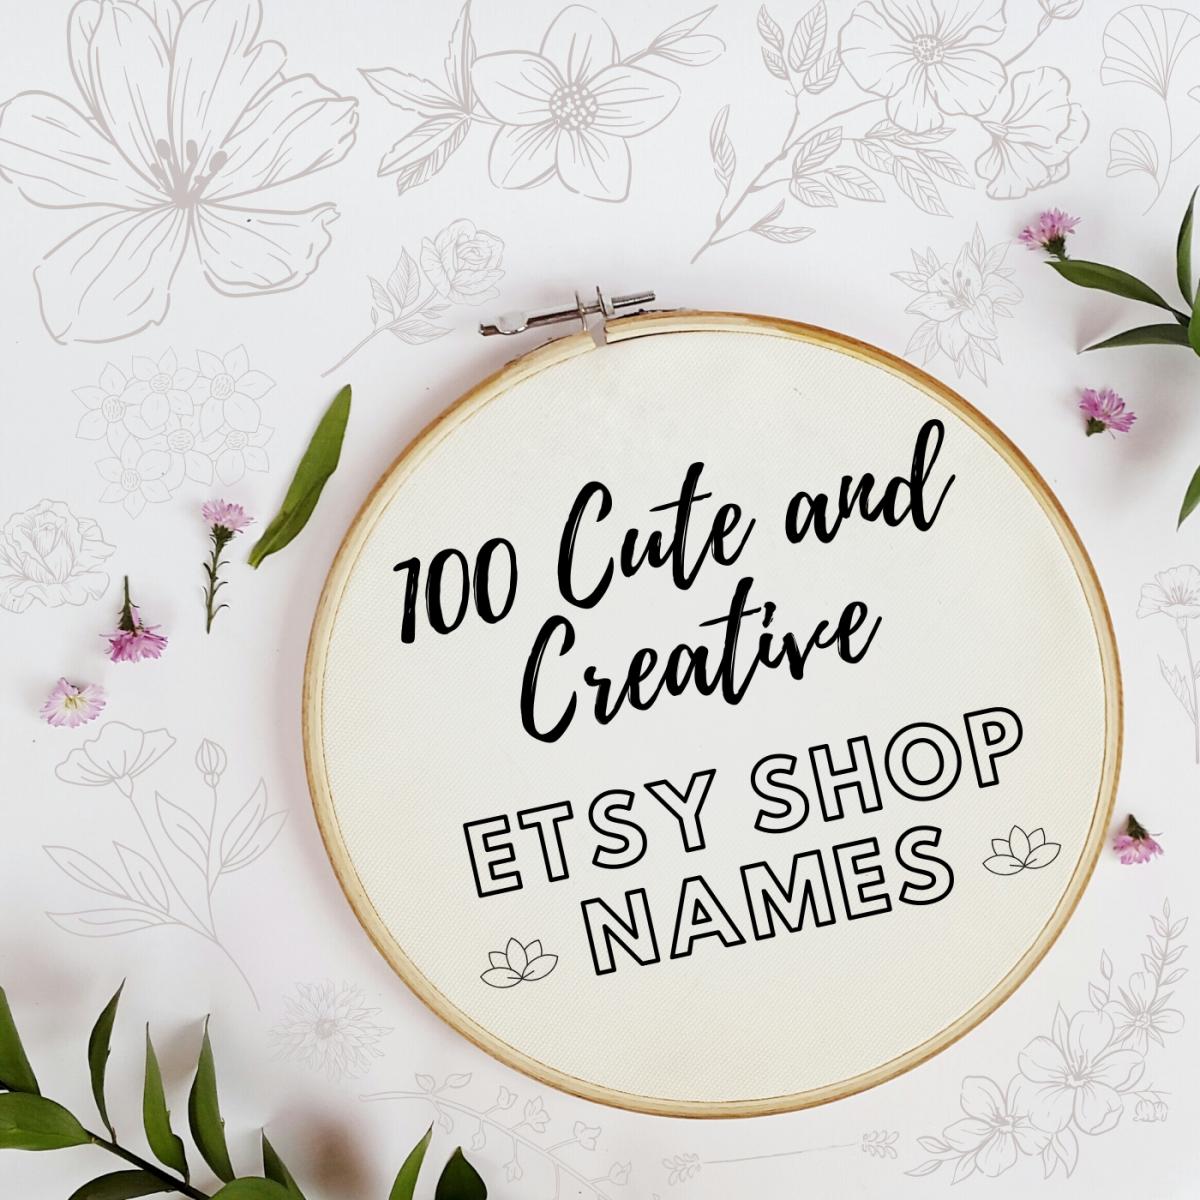 100 Crafty Etsy Name Ideas